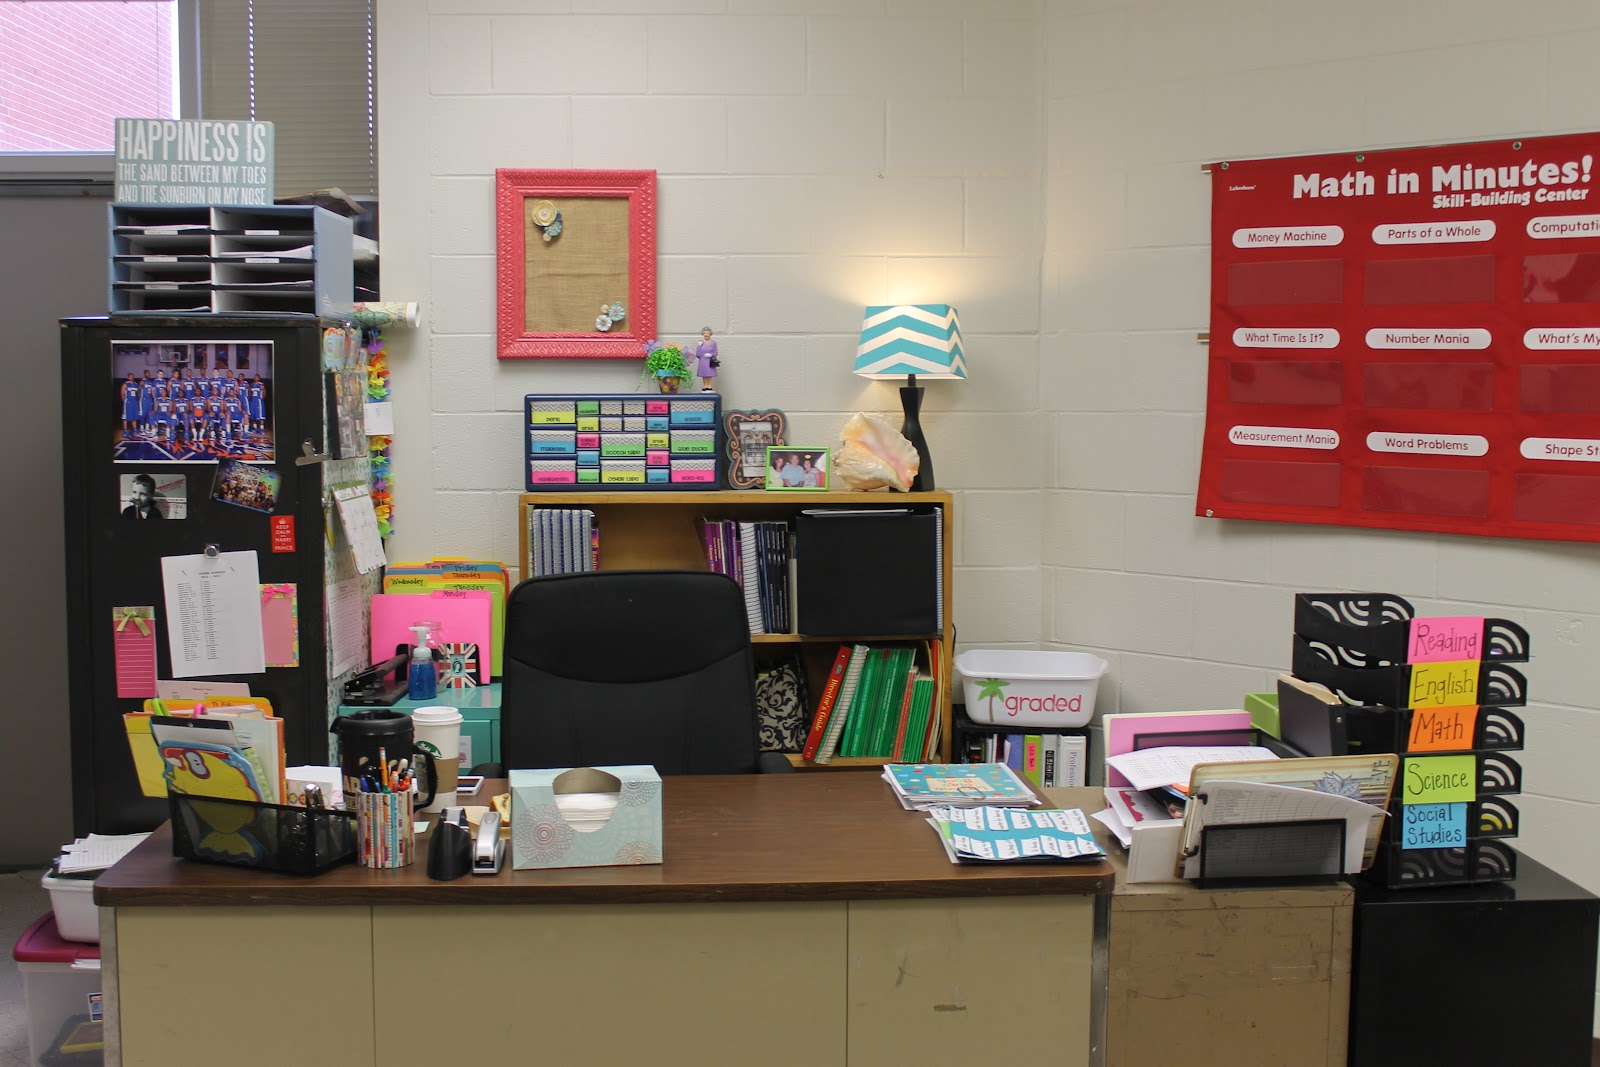 Organized School Desk Clip Art Organized school desk clip